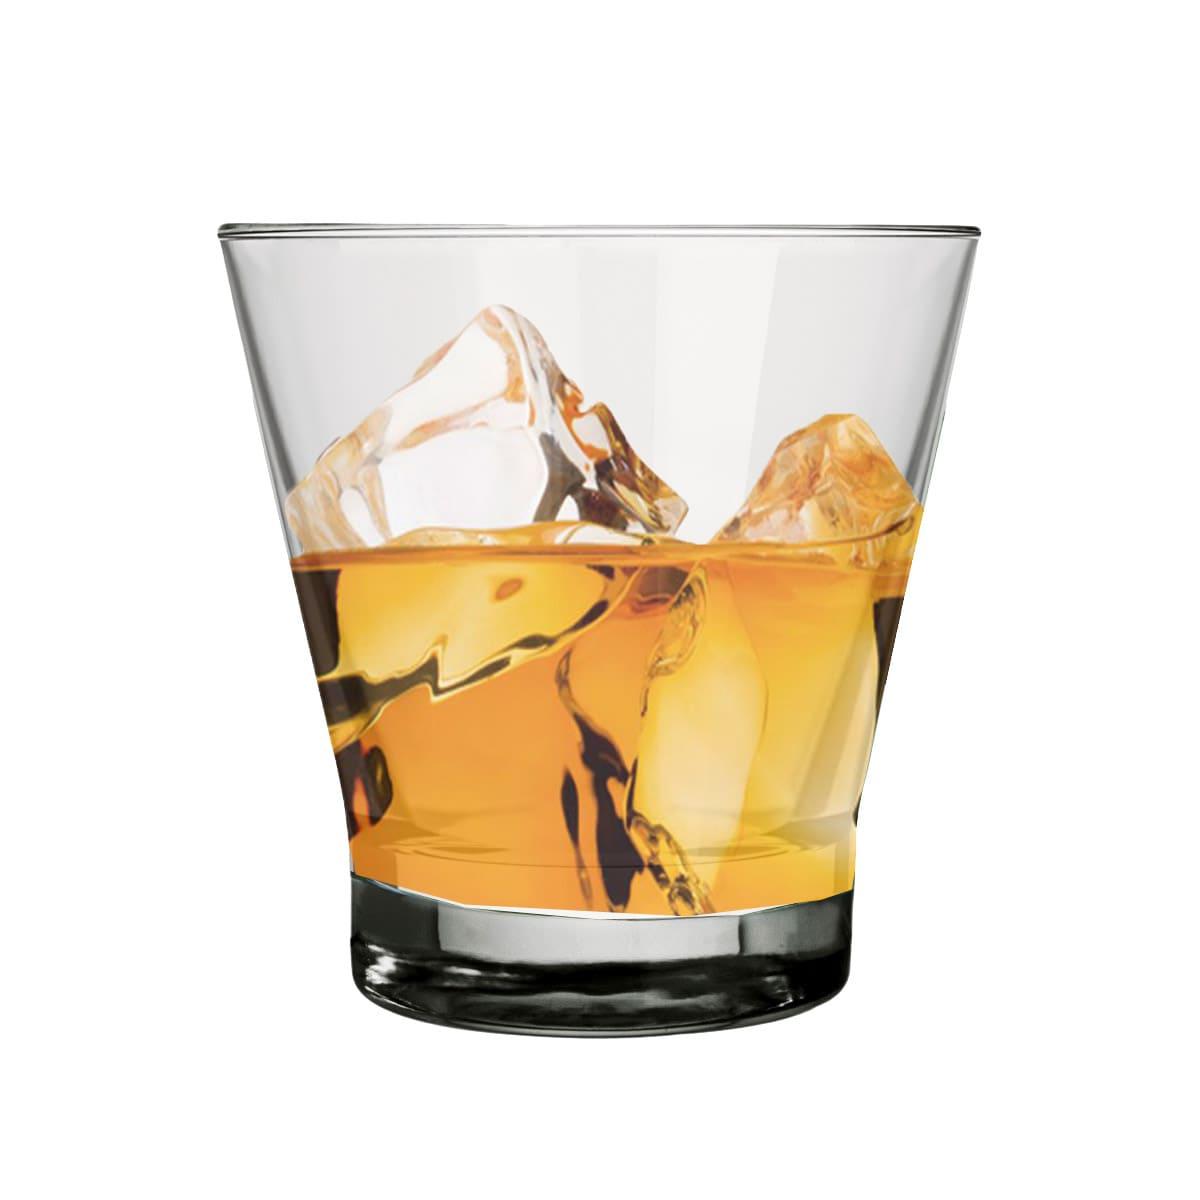 Copo para Whisky Doble Conic Rocks 350ml